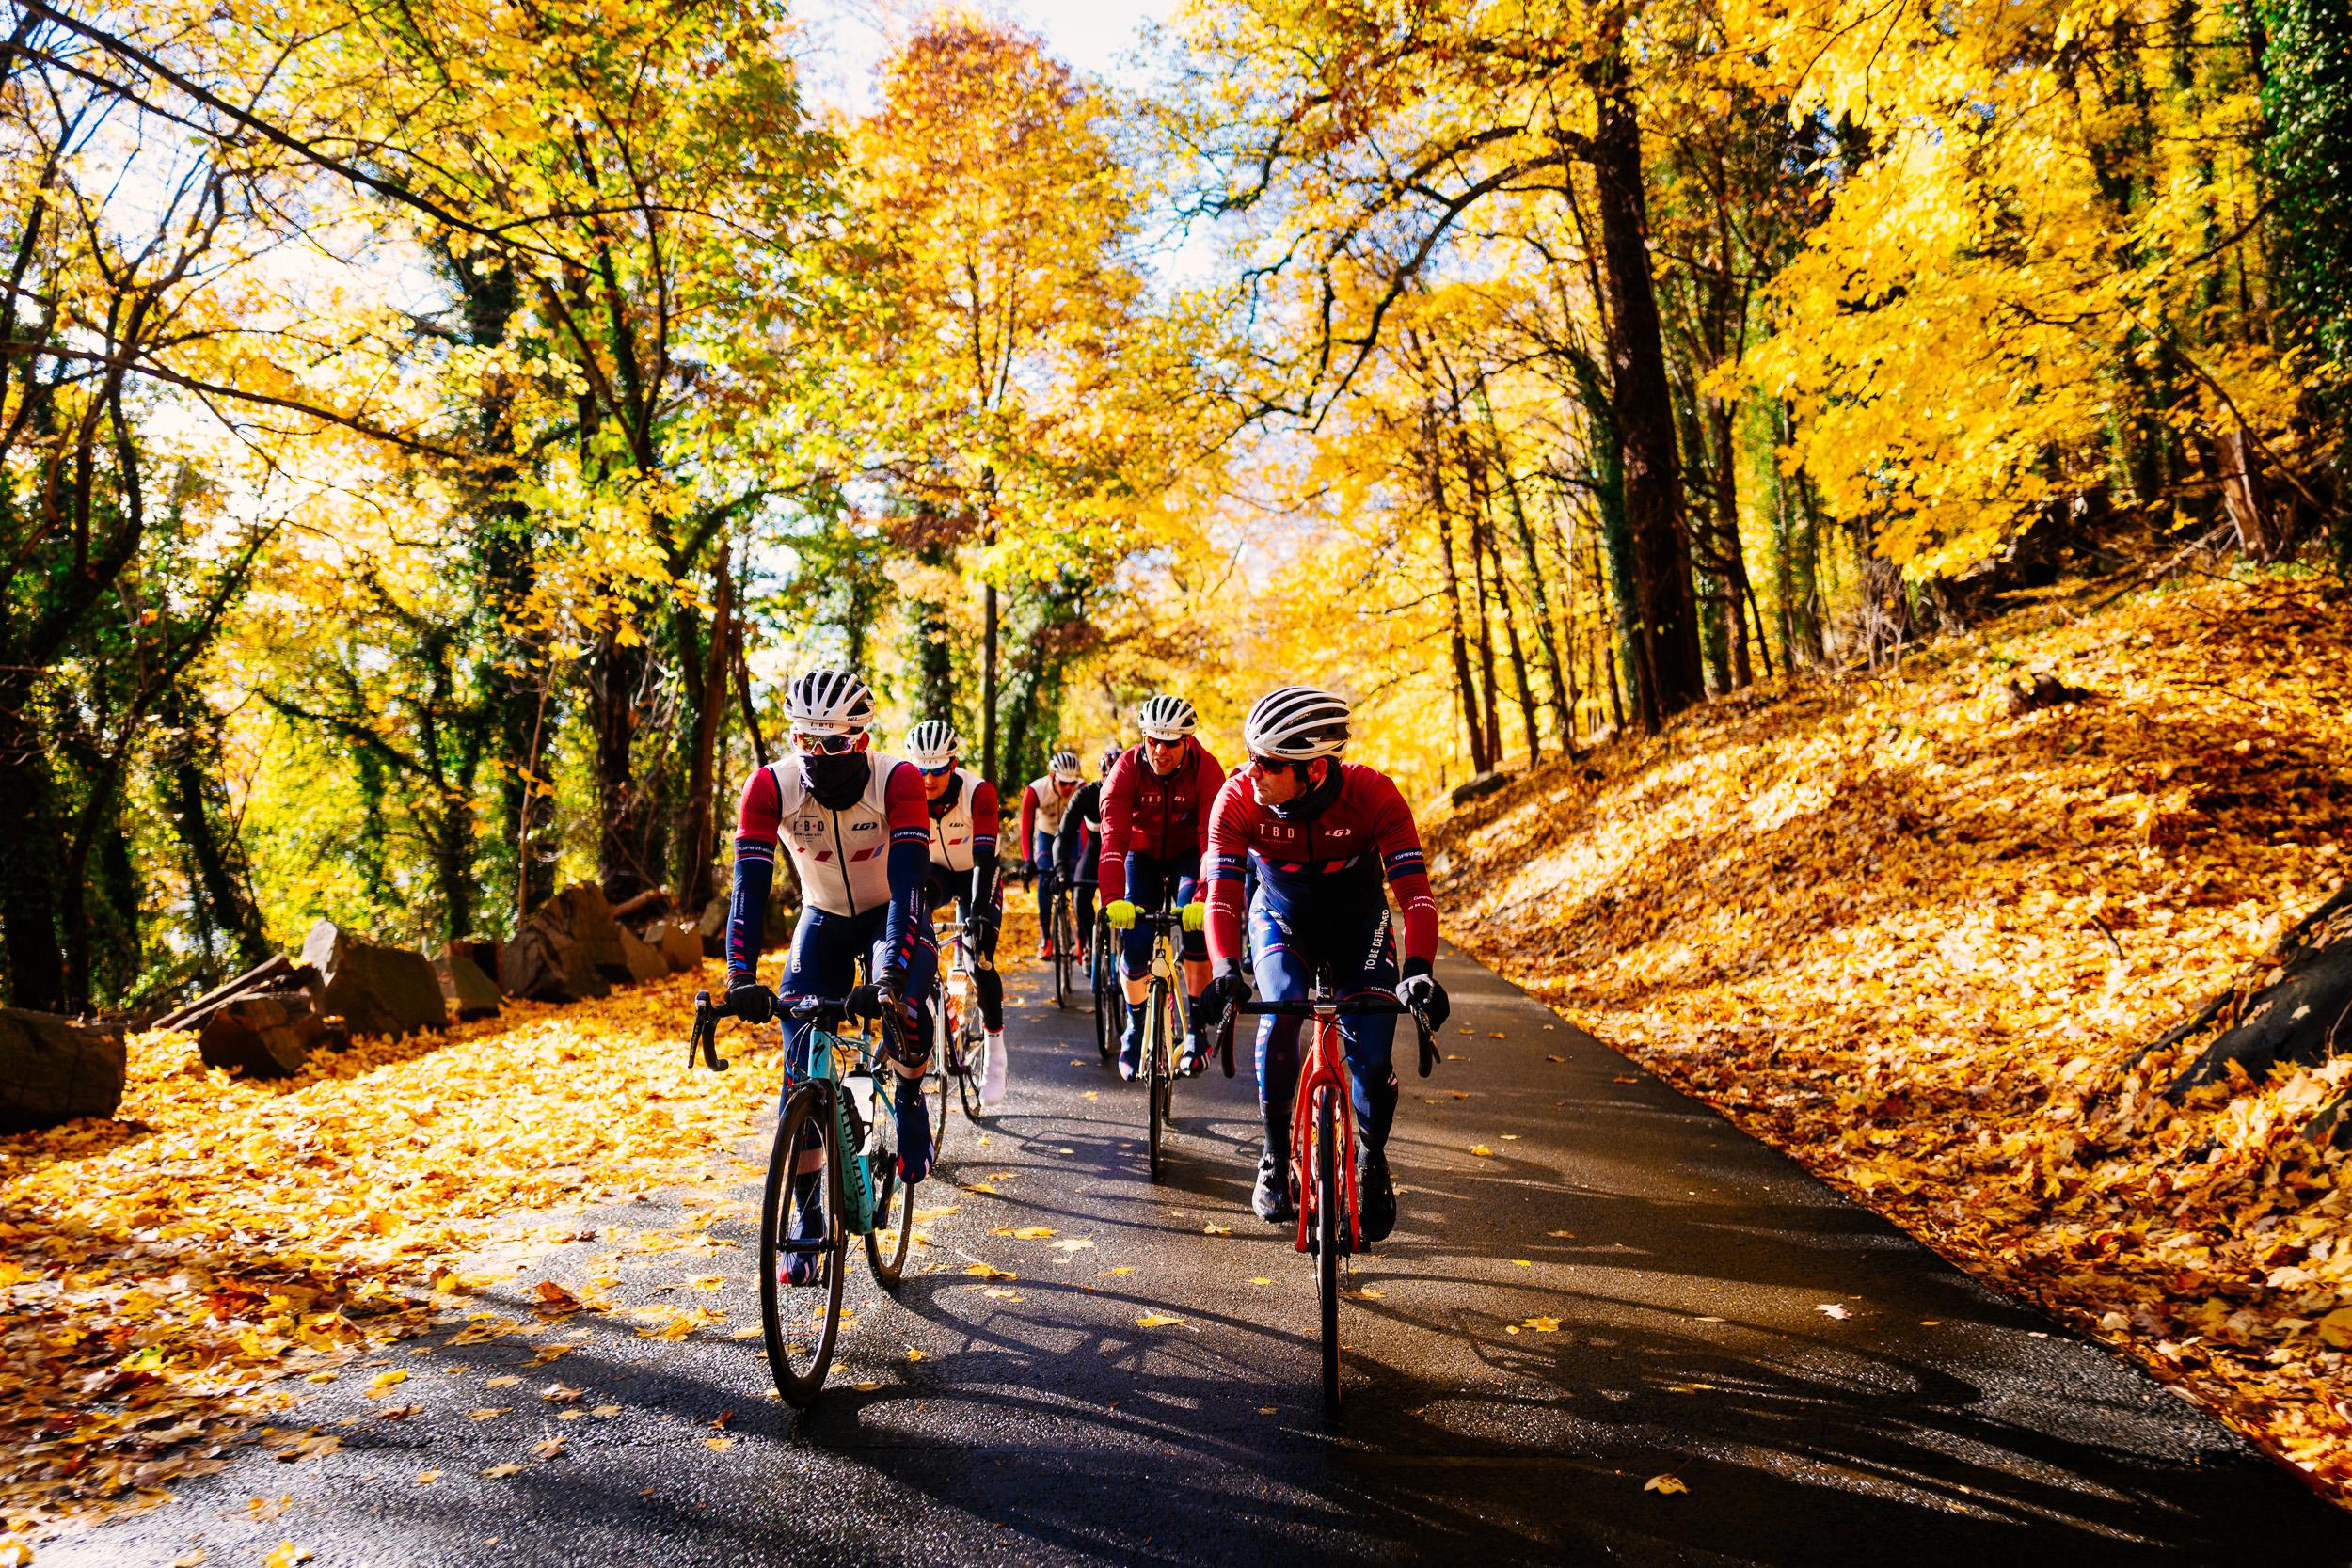 photo-rhetoric-to-be-determined-river-road-fall-foliage-5021.jpg